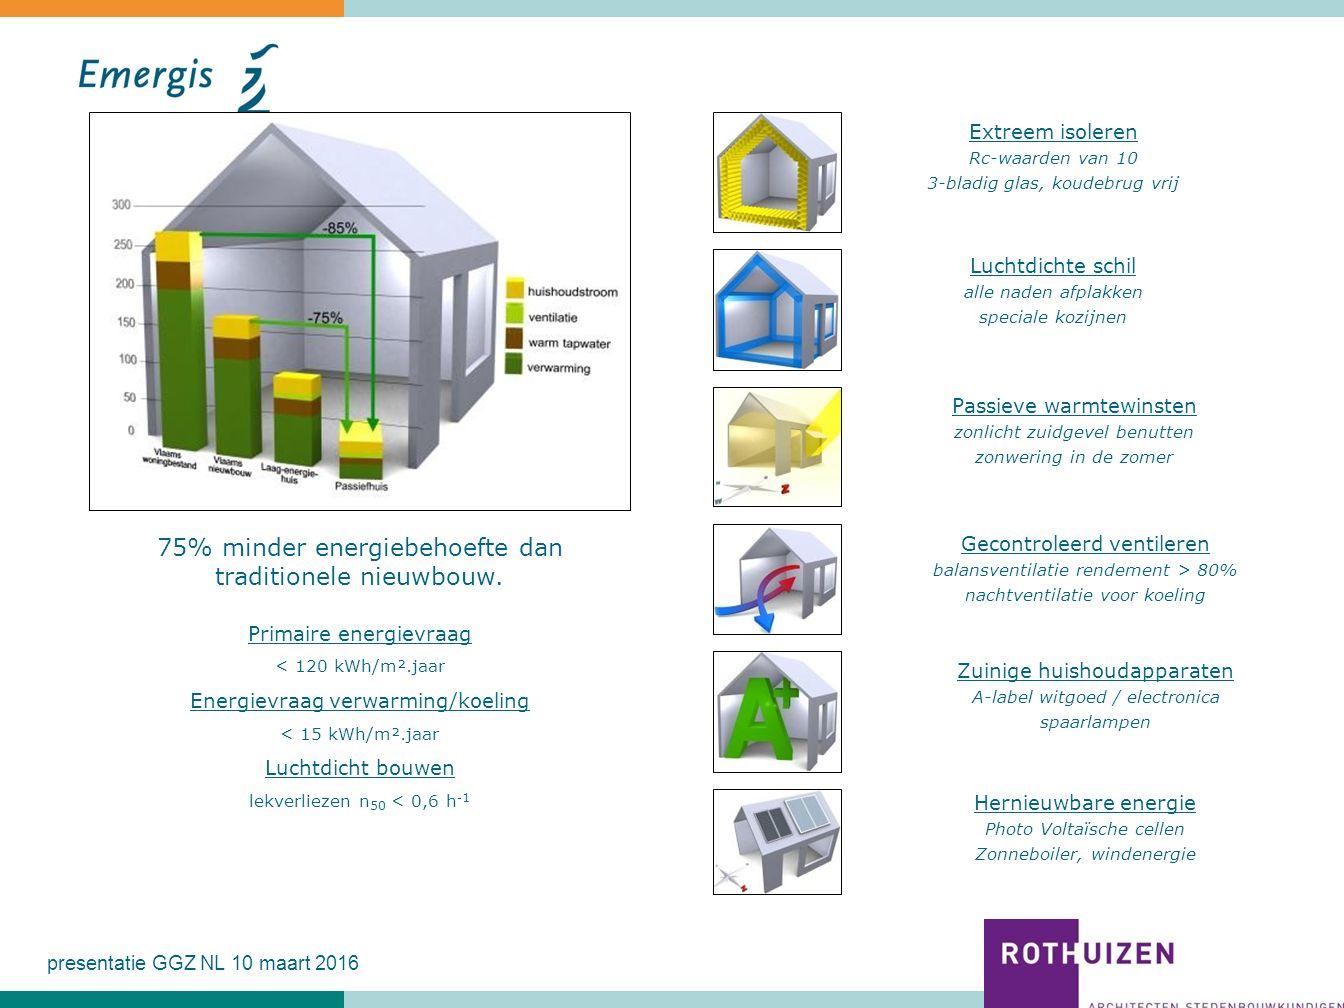 75% minder energiebehoefte dan traditionele nieuwbouw. Primaire energievraag < 120 kWh/m².jaar Energievraag verwarming/koeling < 15 kWh/m².jaar Luchtd